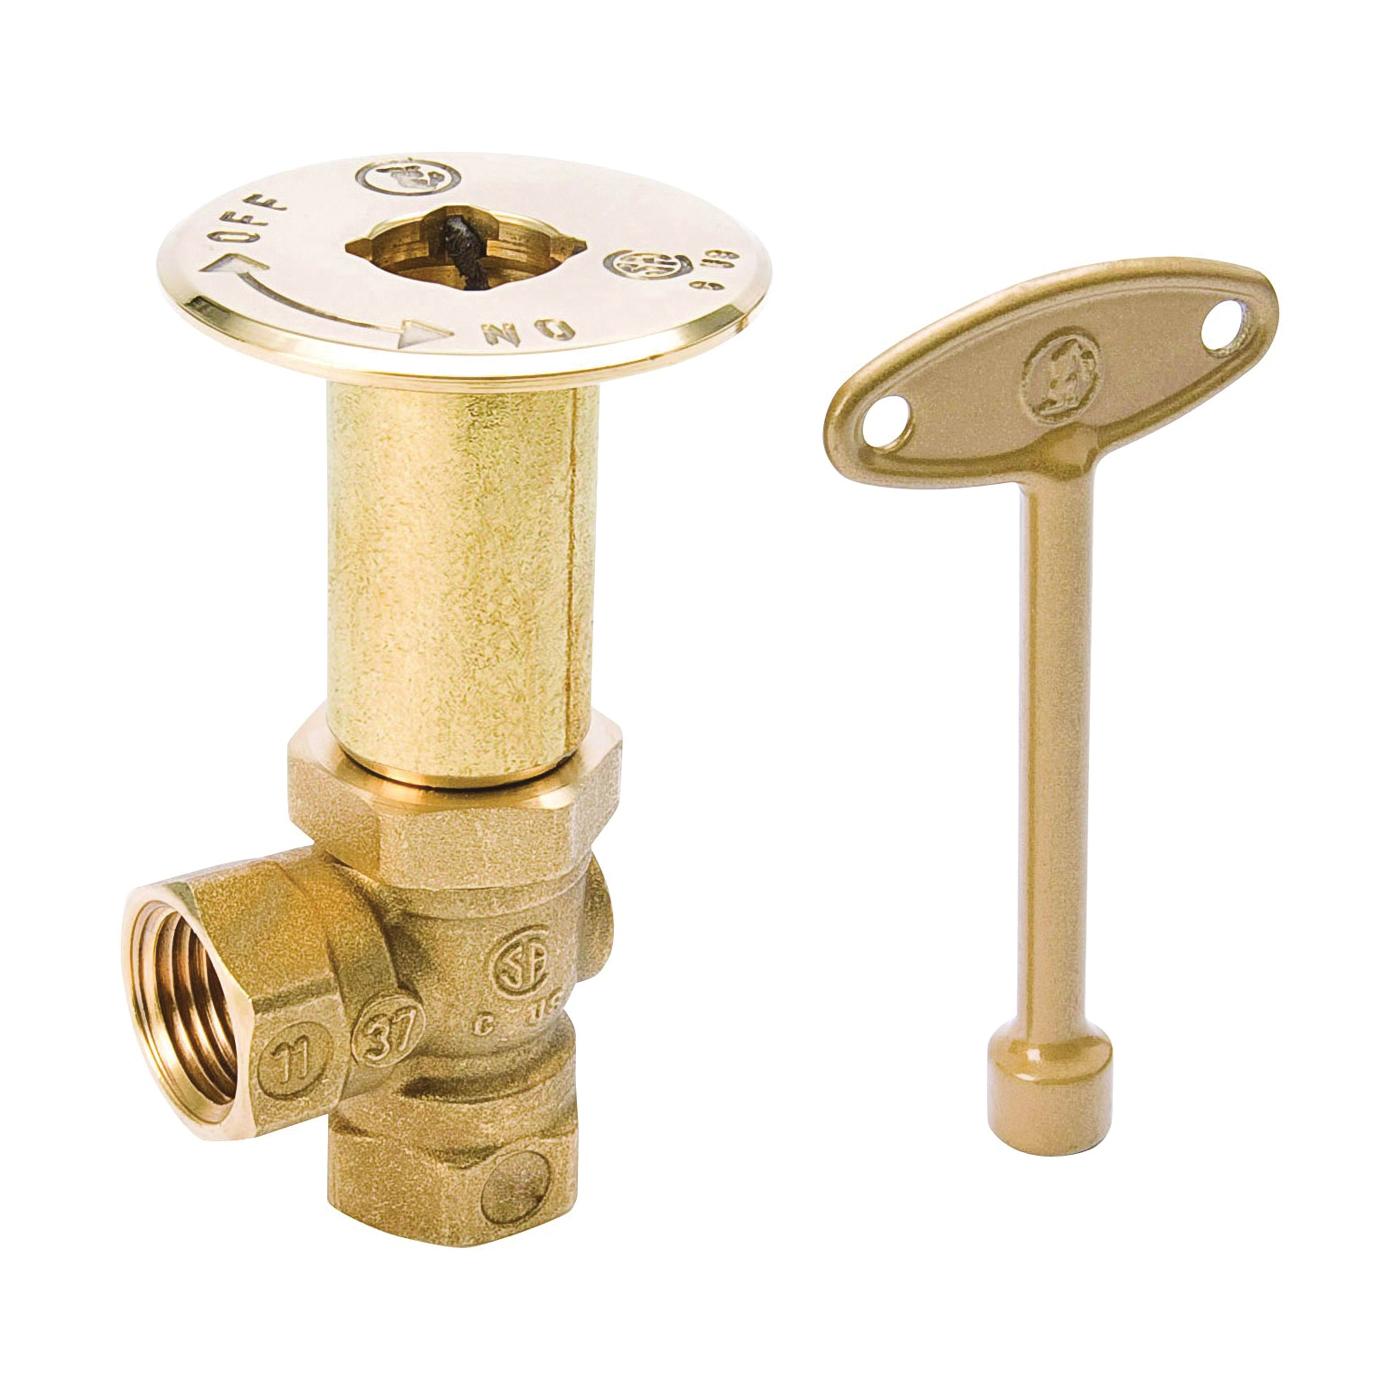 Picture of B & K 118-004 Log Lighter Valve, 1/2 in, Brass